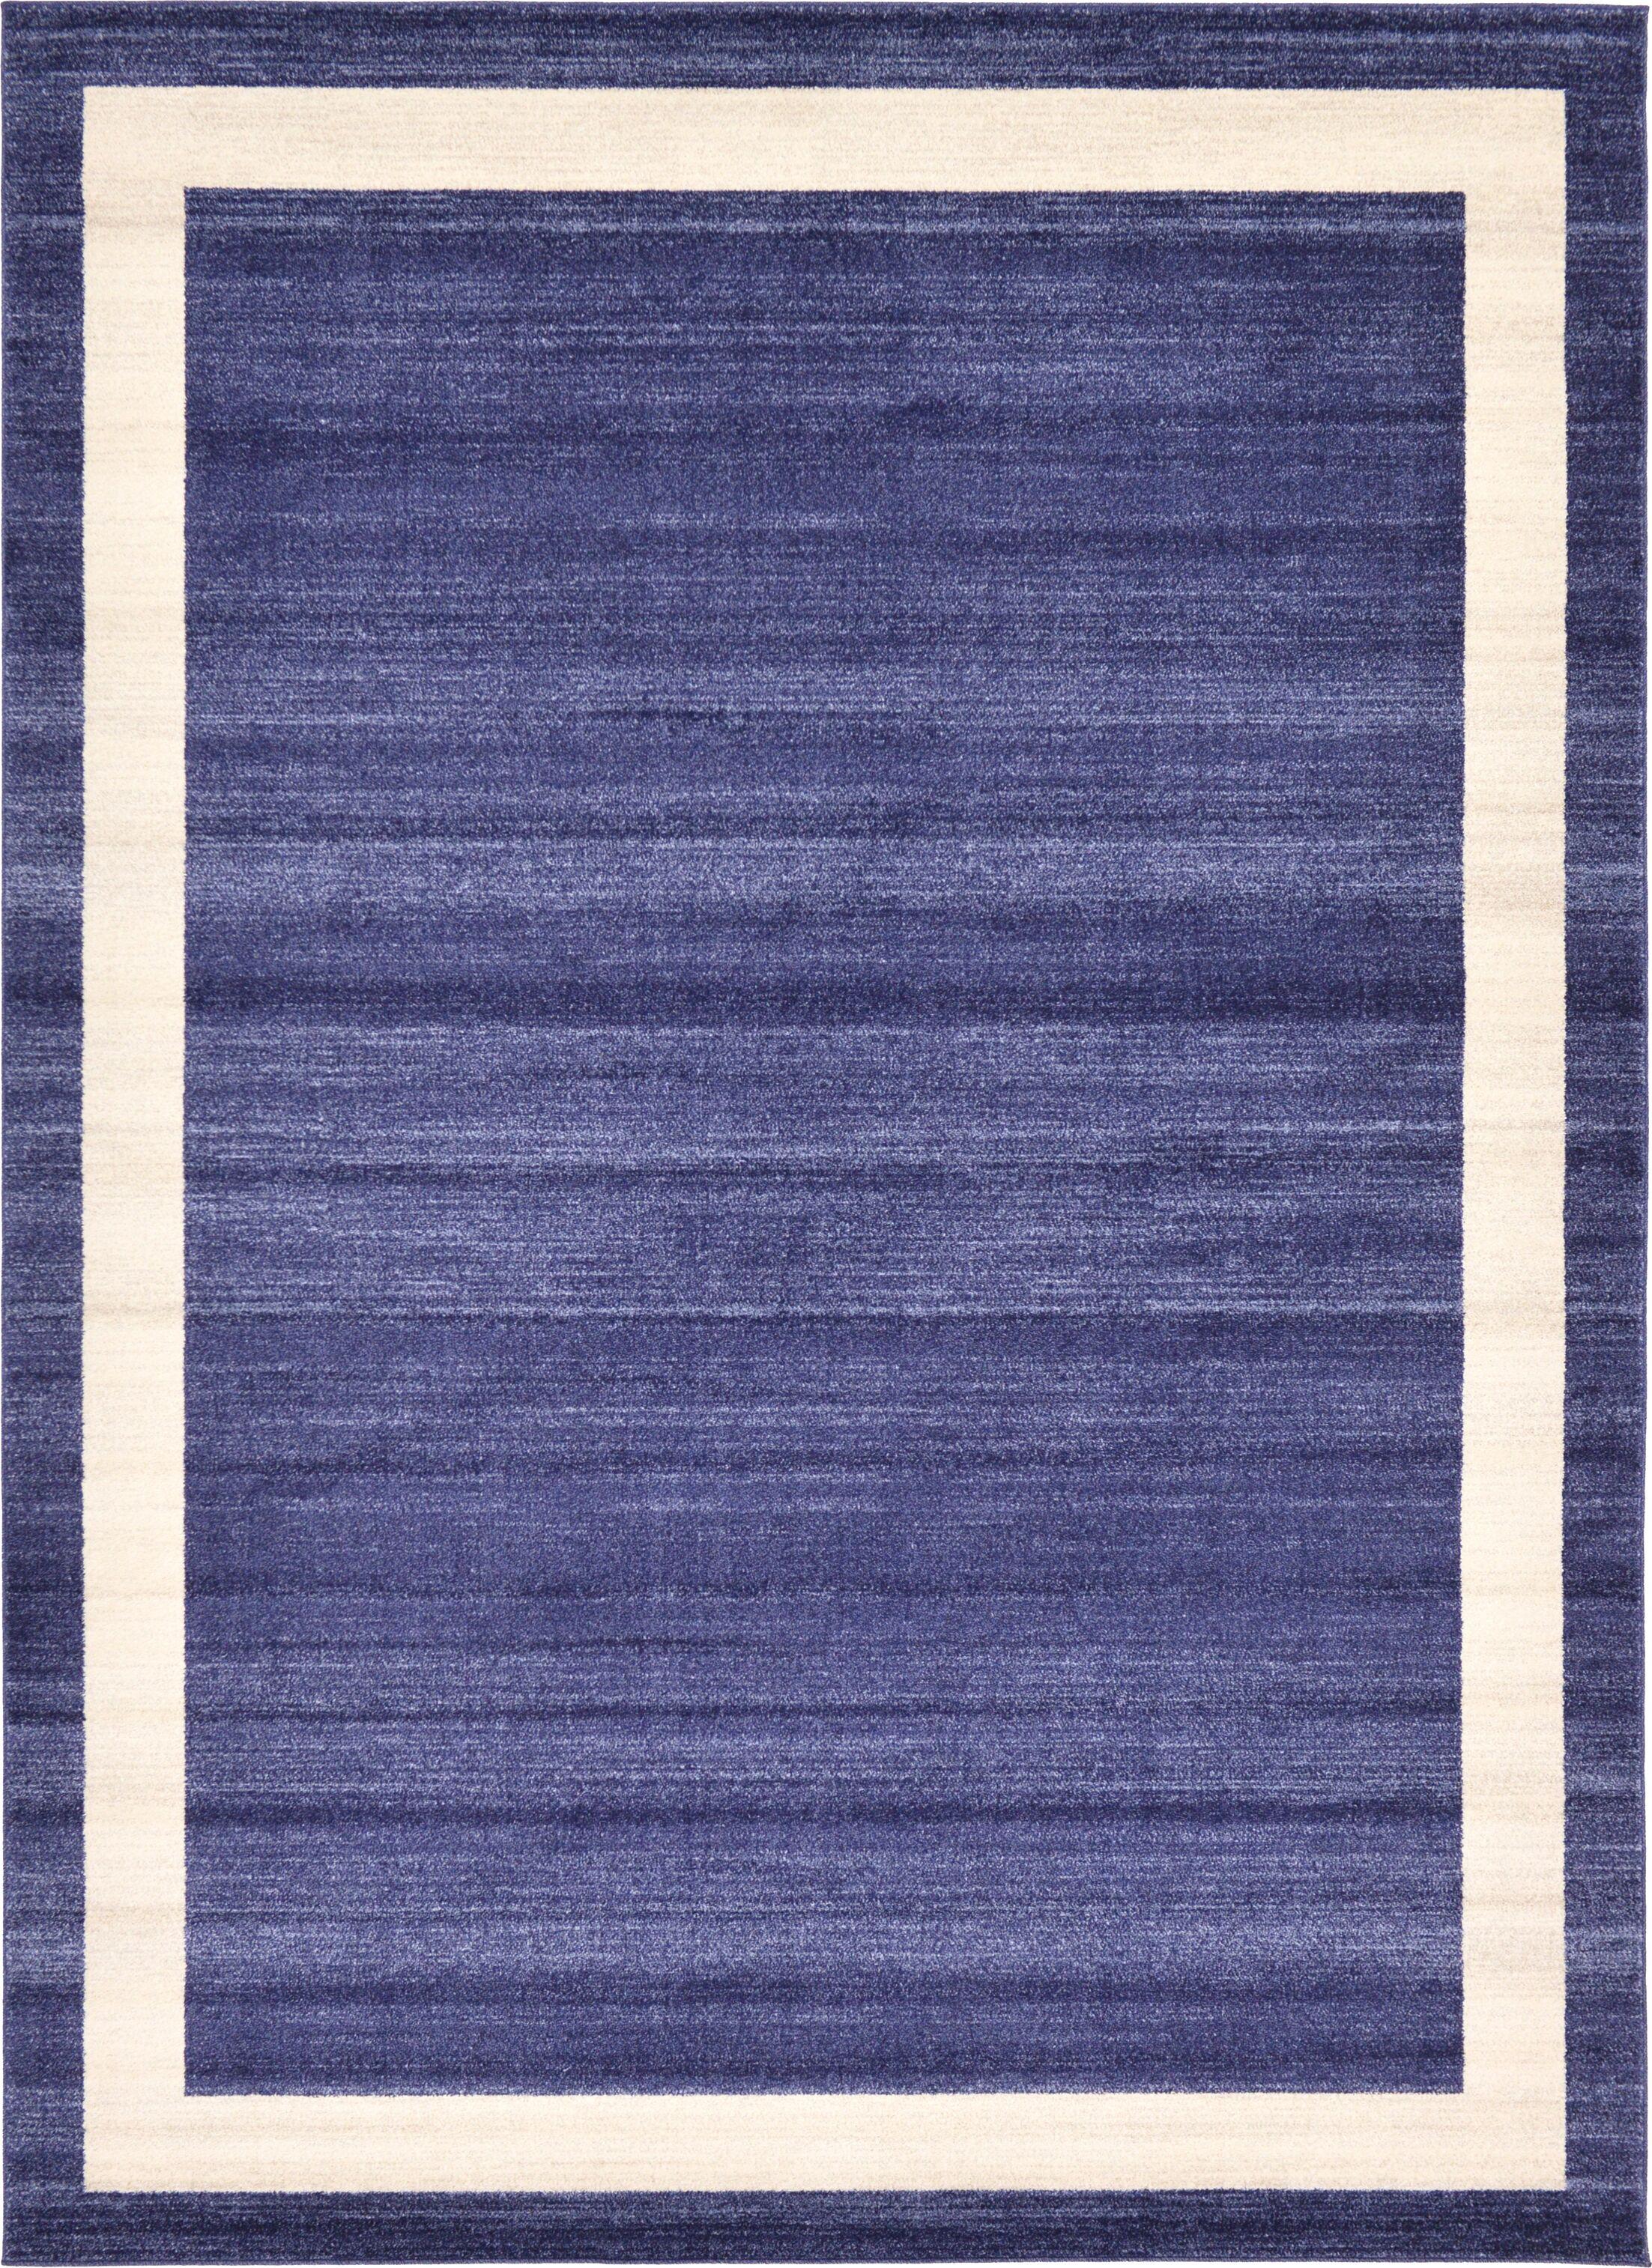 Christi Blue/Beige Area Rug Rug Size: Rectangle 8' x 11'